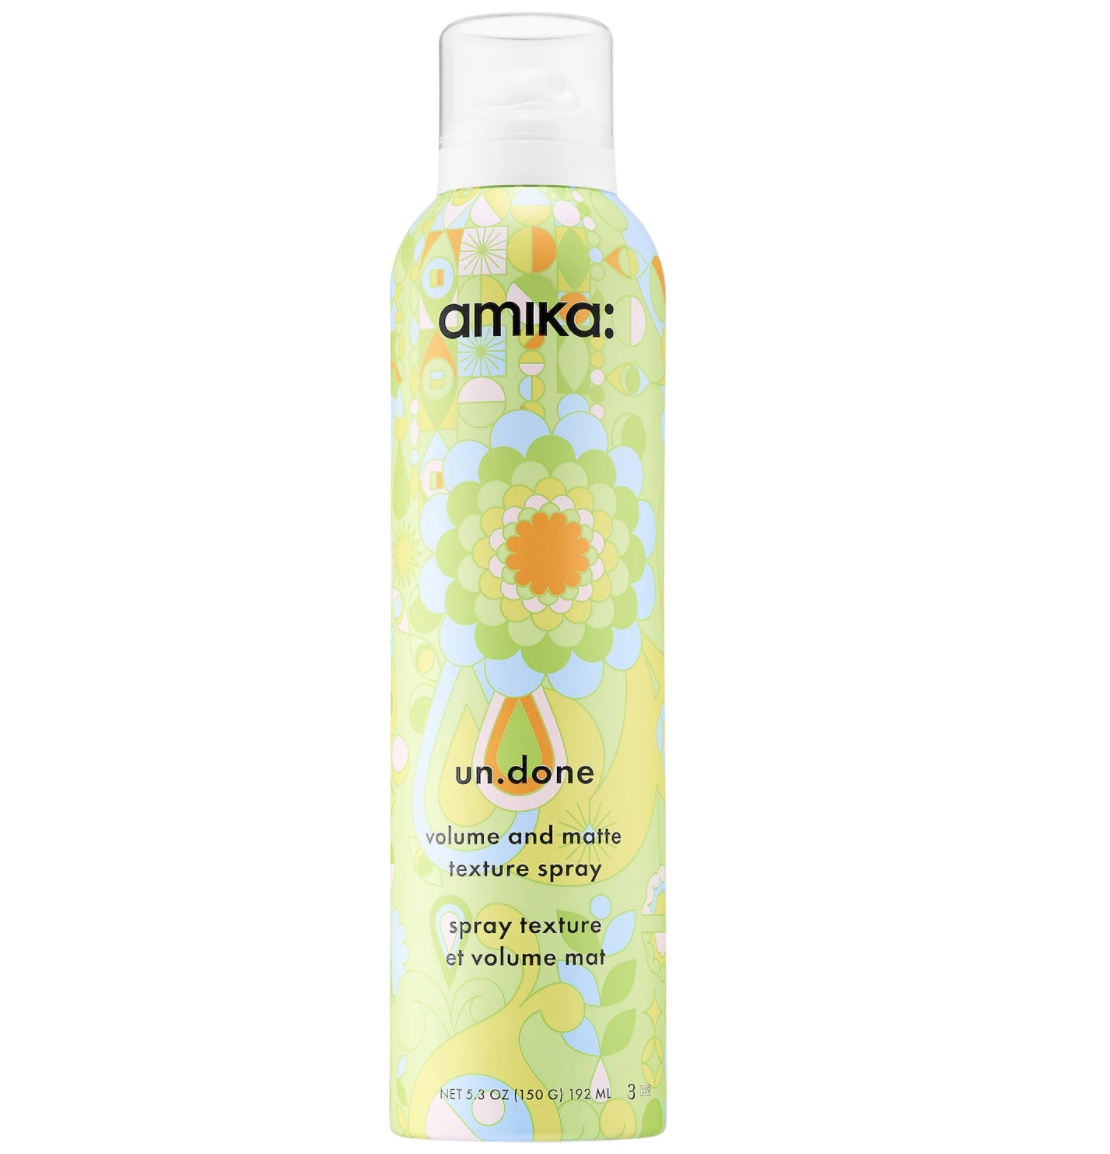 amika un.done volume and matte texture spray beachy waves tutorial